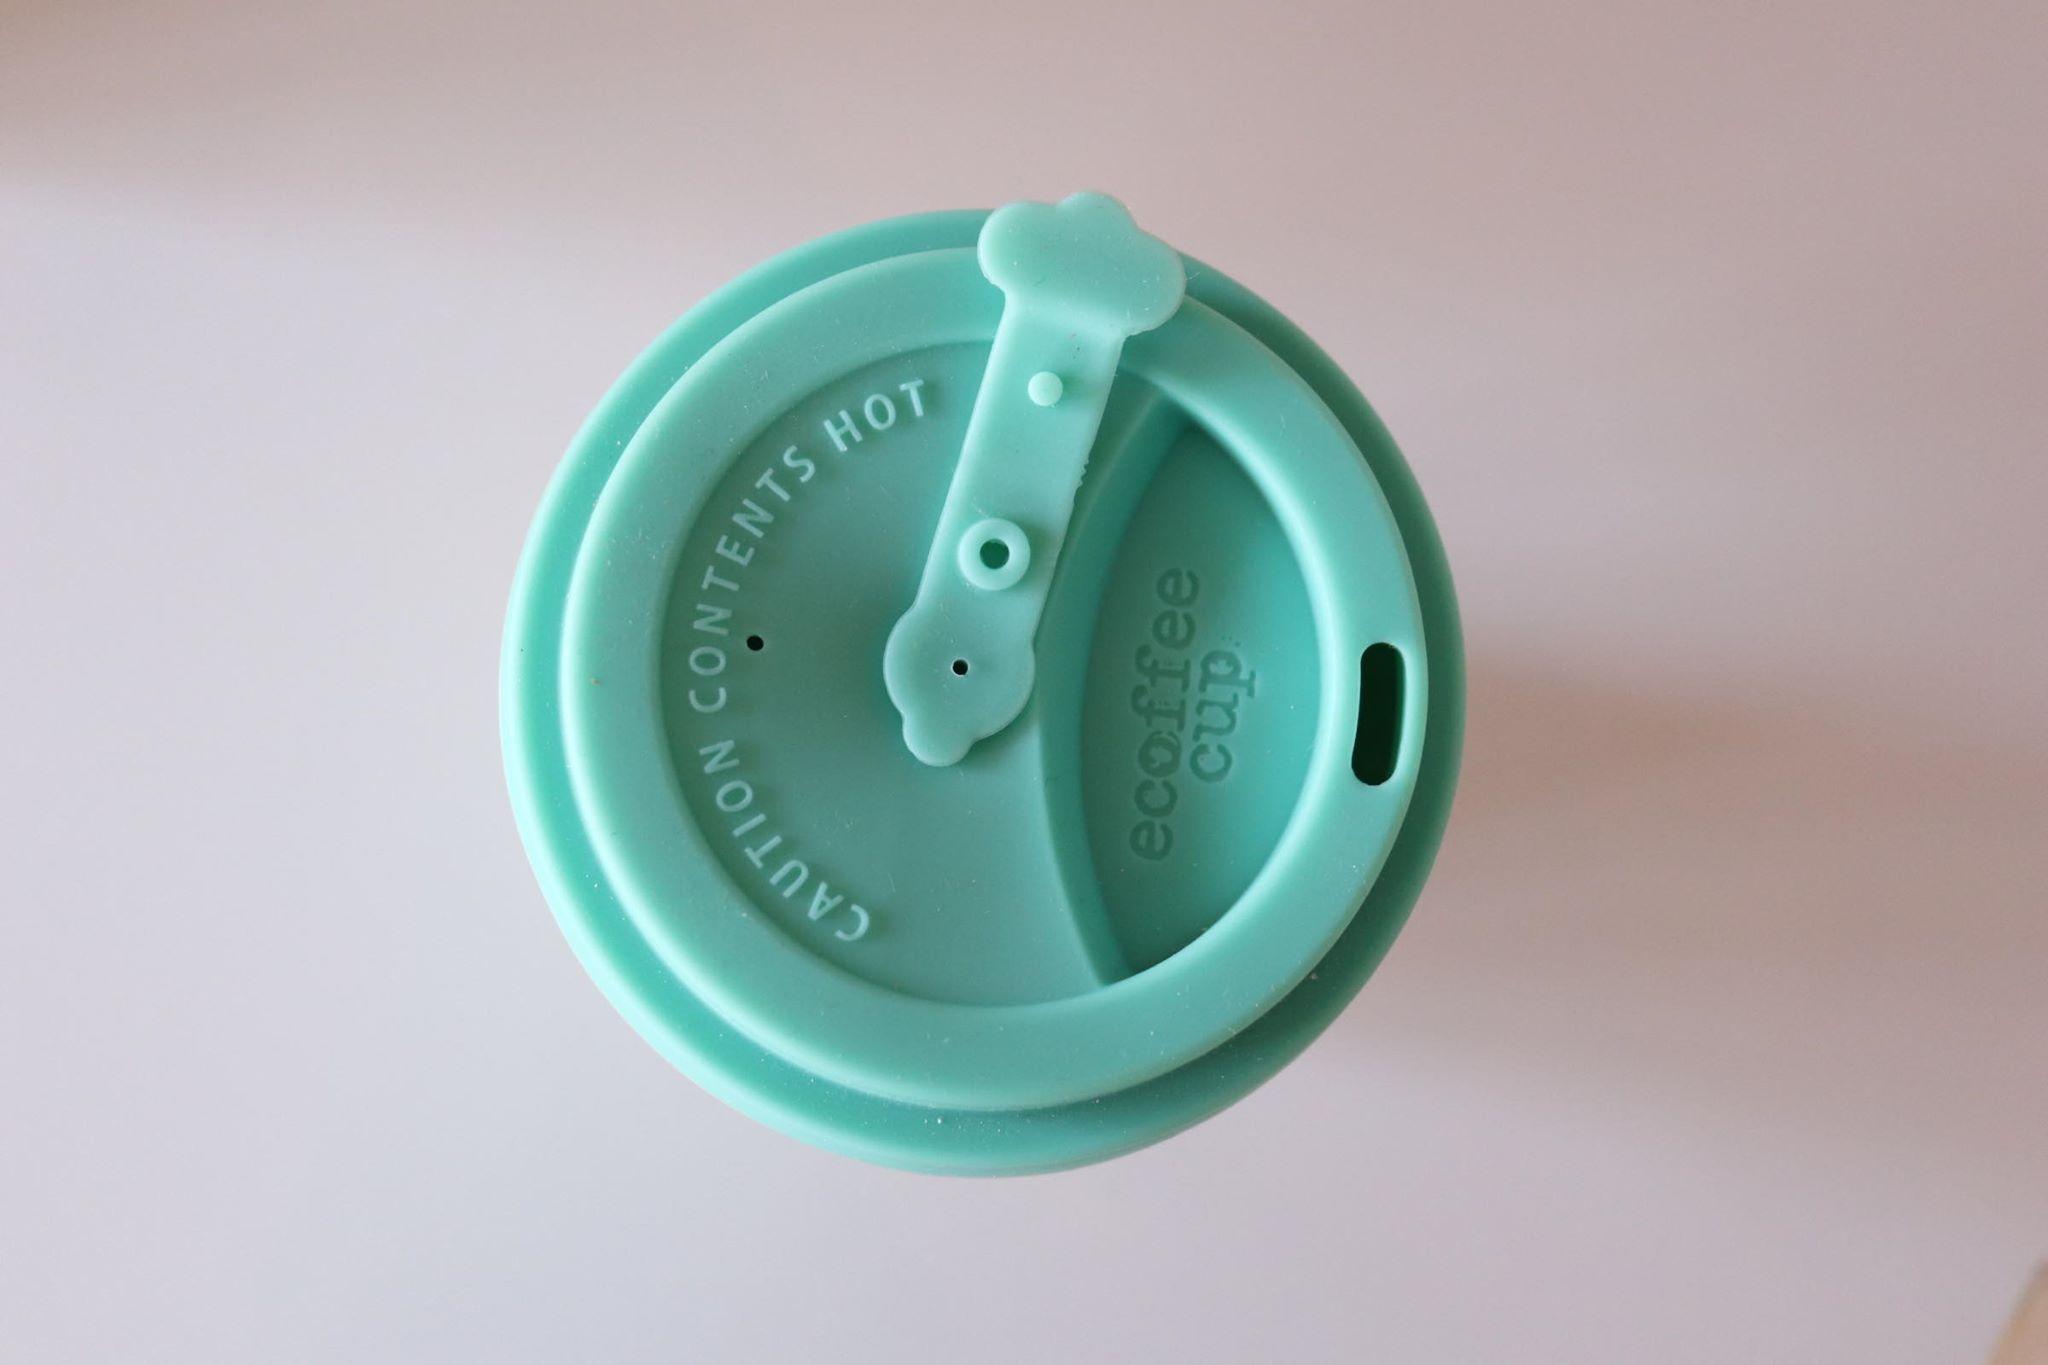 sale!エコーヒーカップ Mサイズ